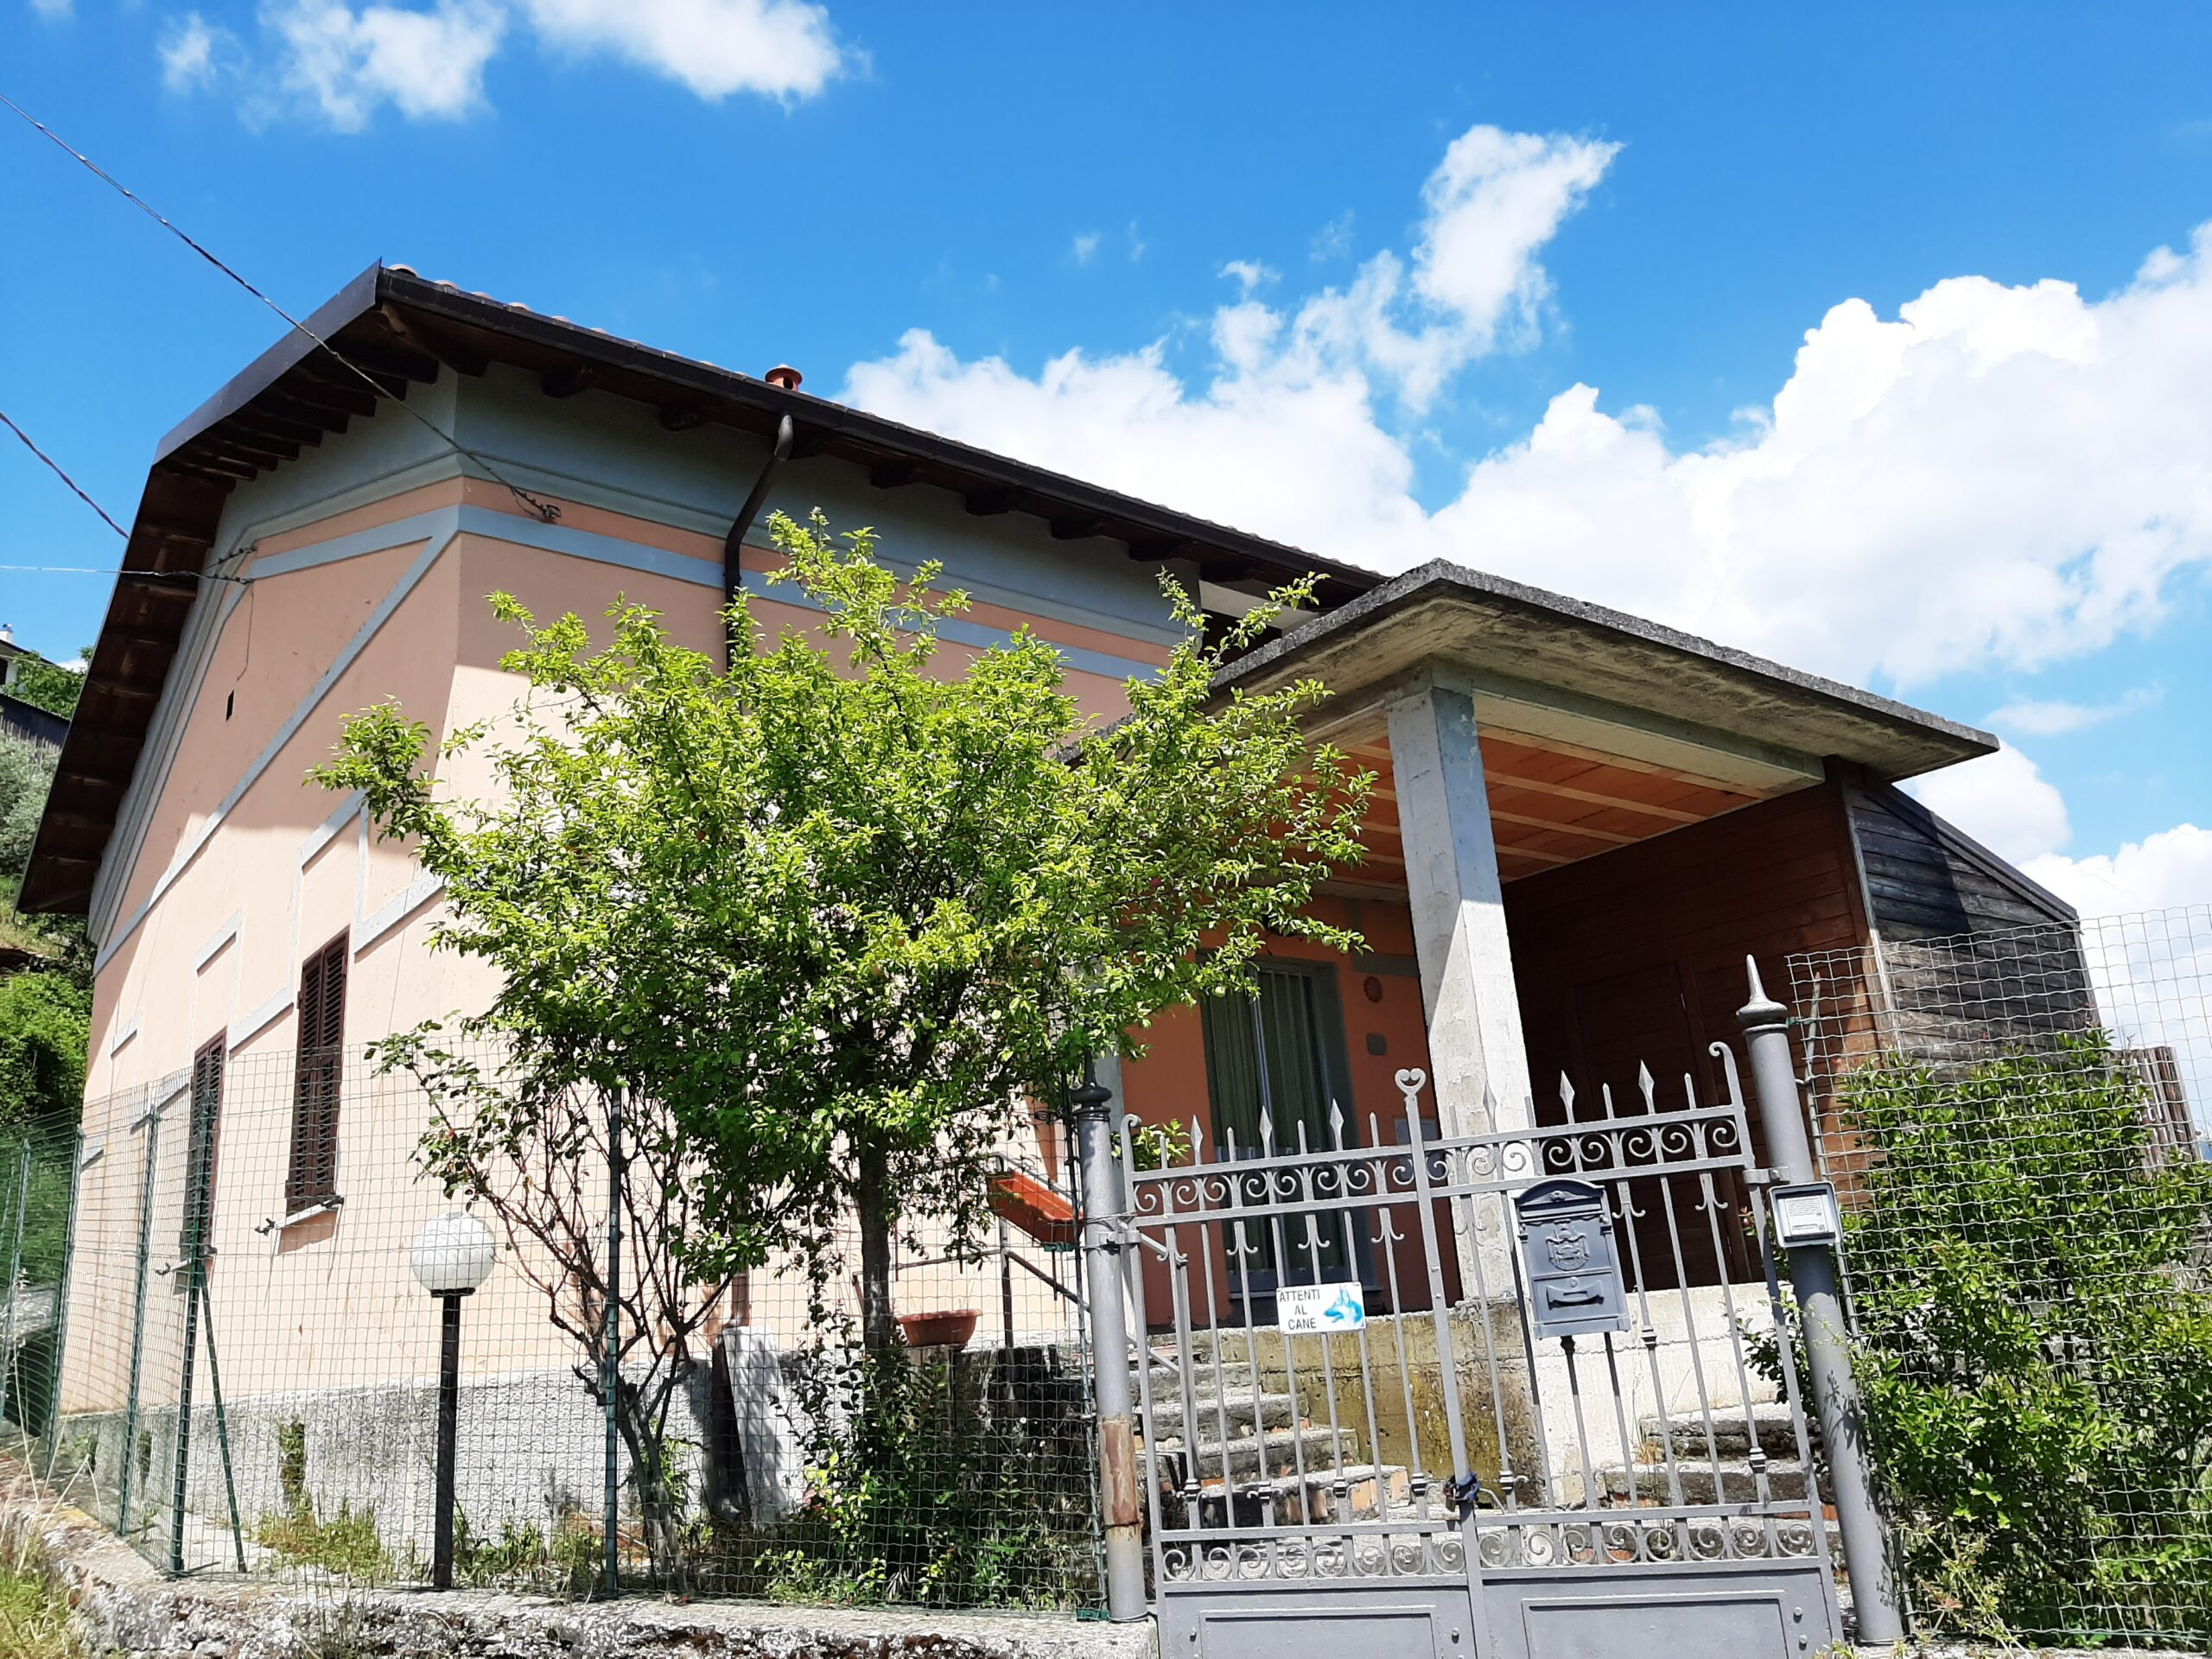 Independent house, fantastic location in Lunigiana ref. 2203